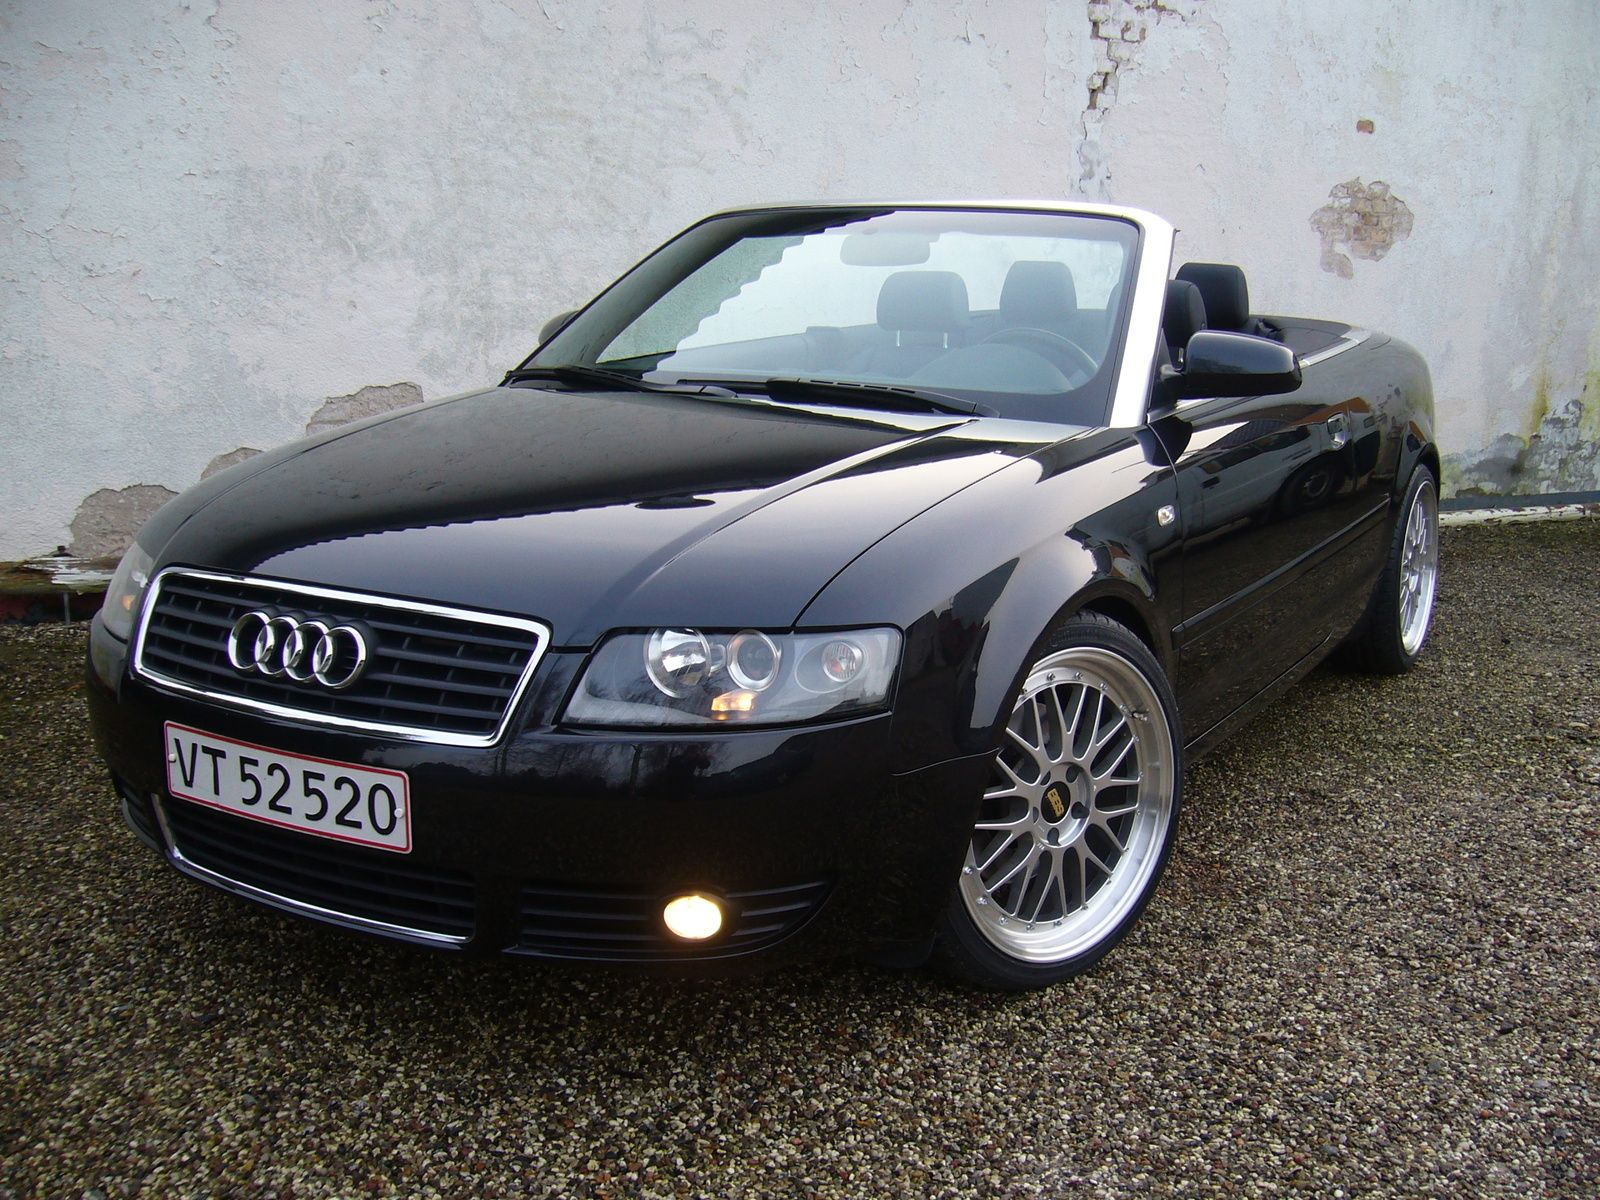 2004 audi a4 audi a4 convertibleaudi carscars for saleused